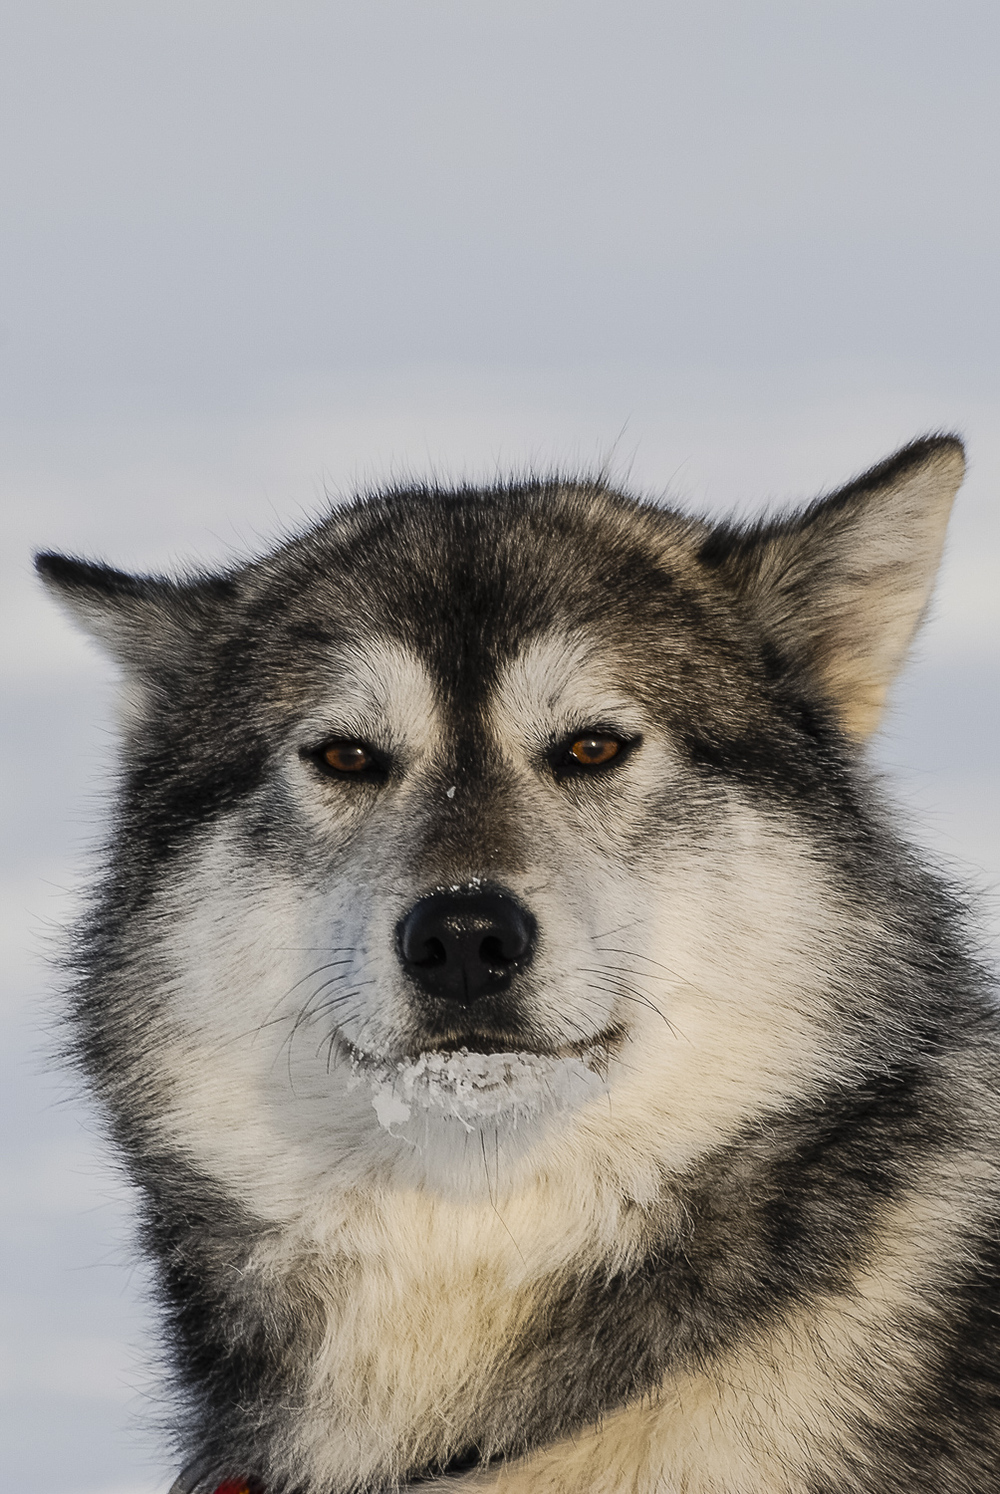 Wise Sled Dog - Puvirnituq, Nunavik, Canadian Arctic